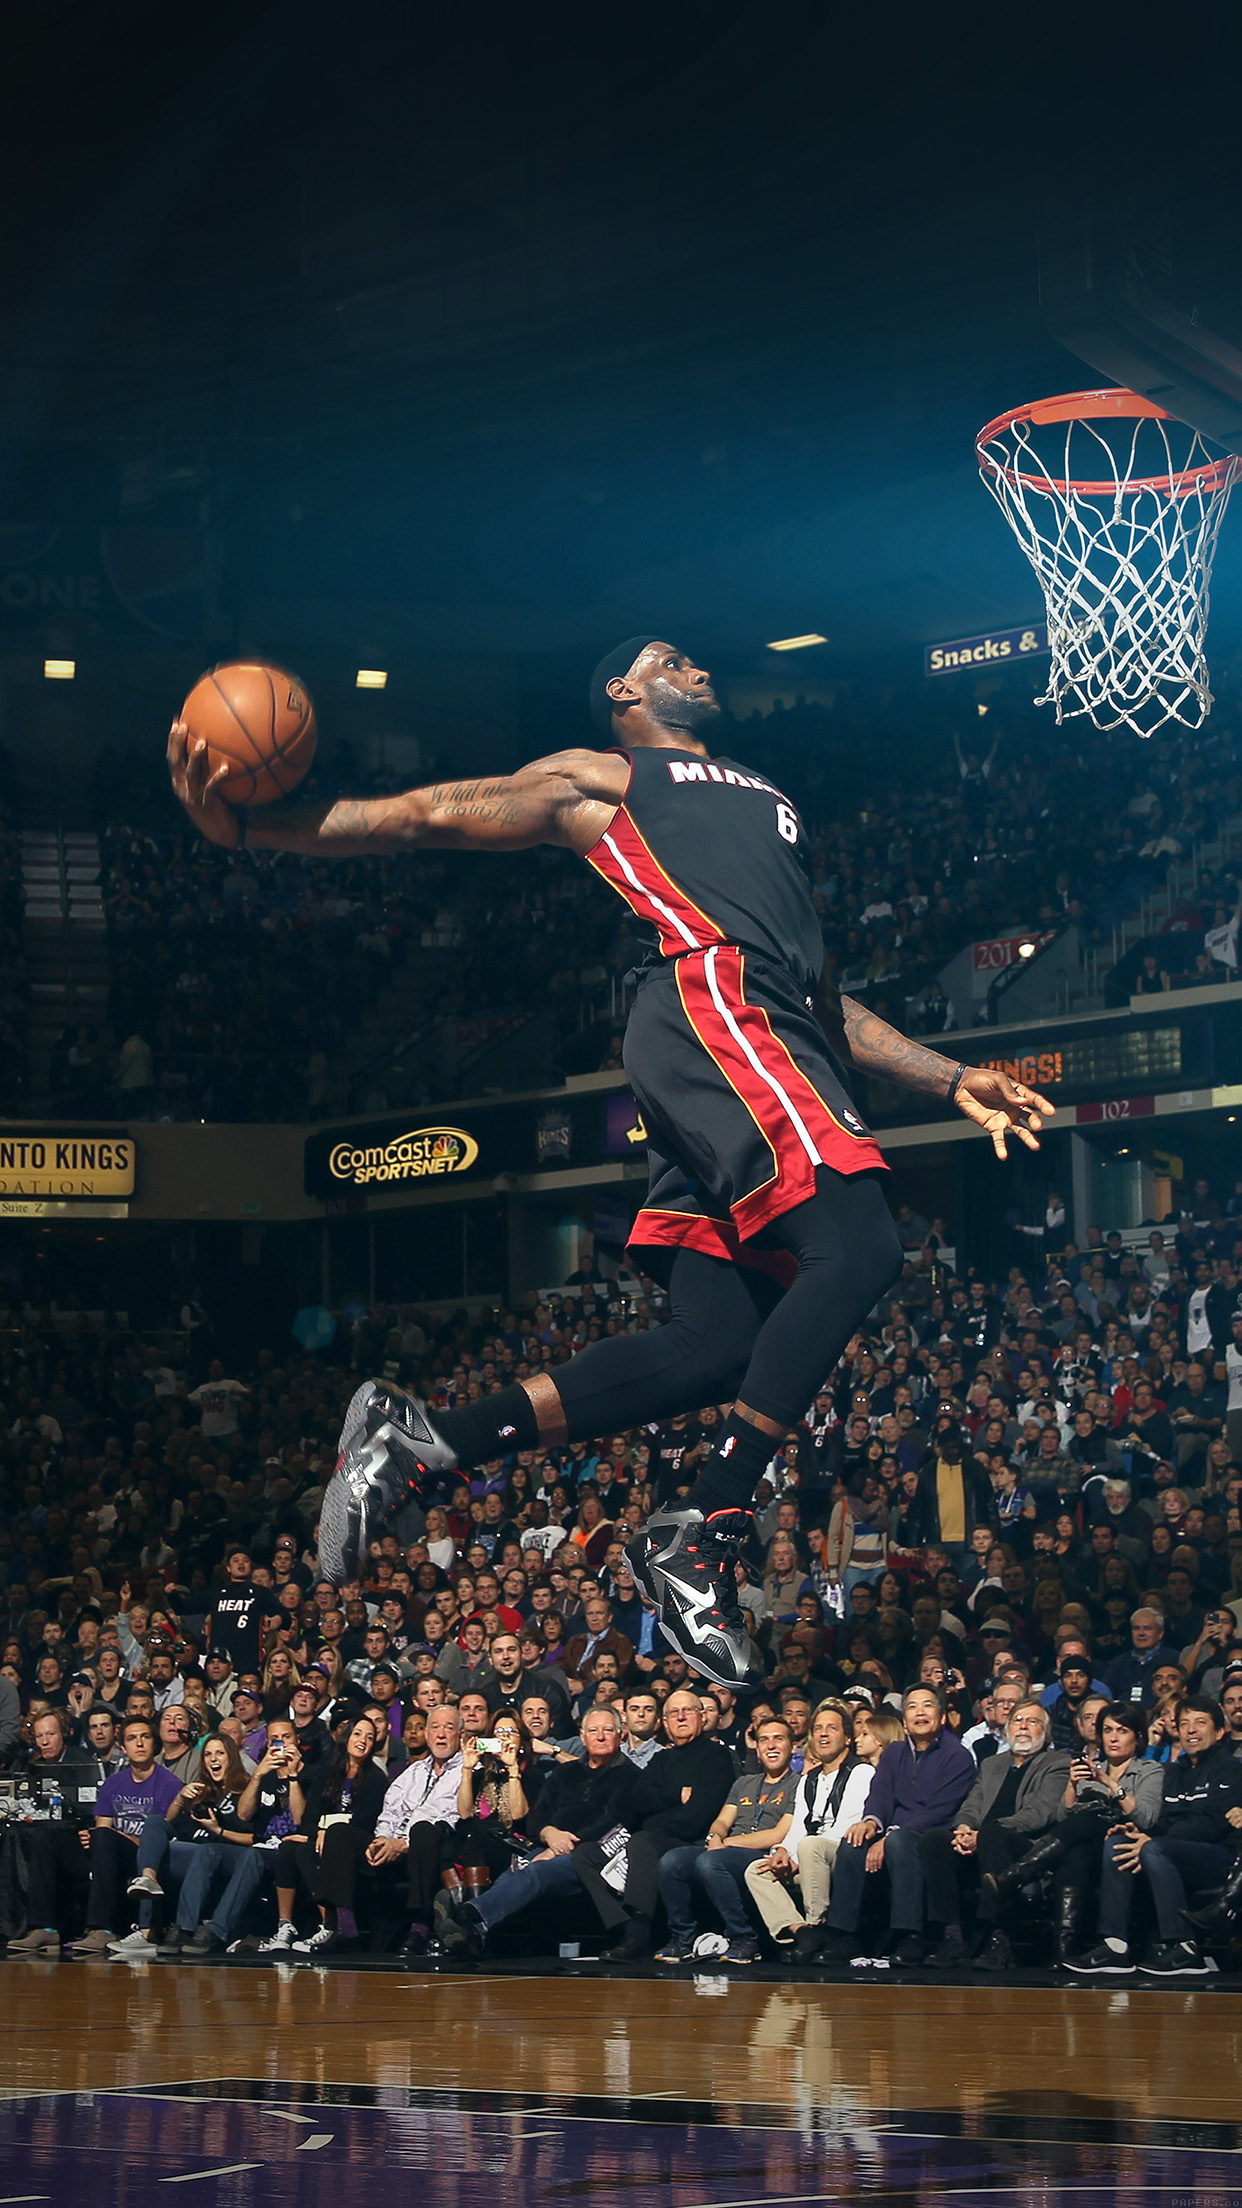 Hf00 Lebron James Dunk Nba Sports Art Flare Basketball